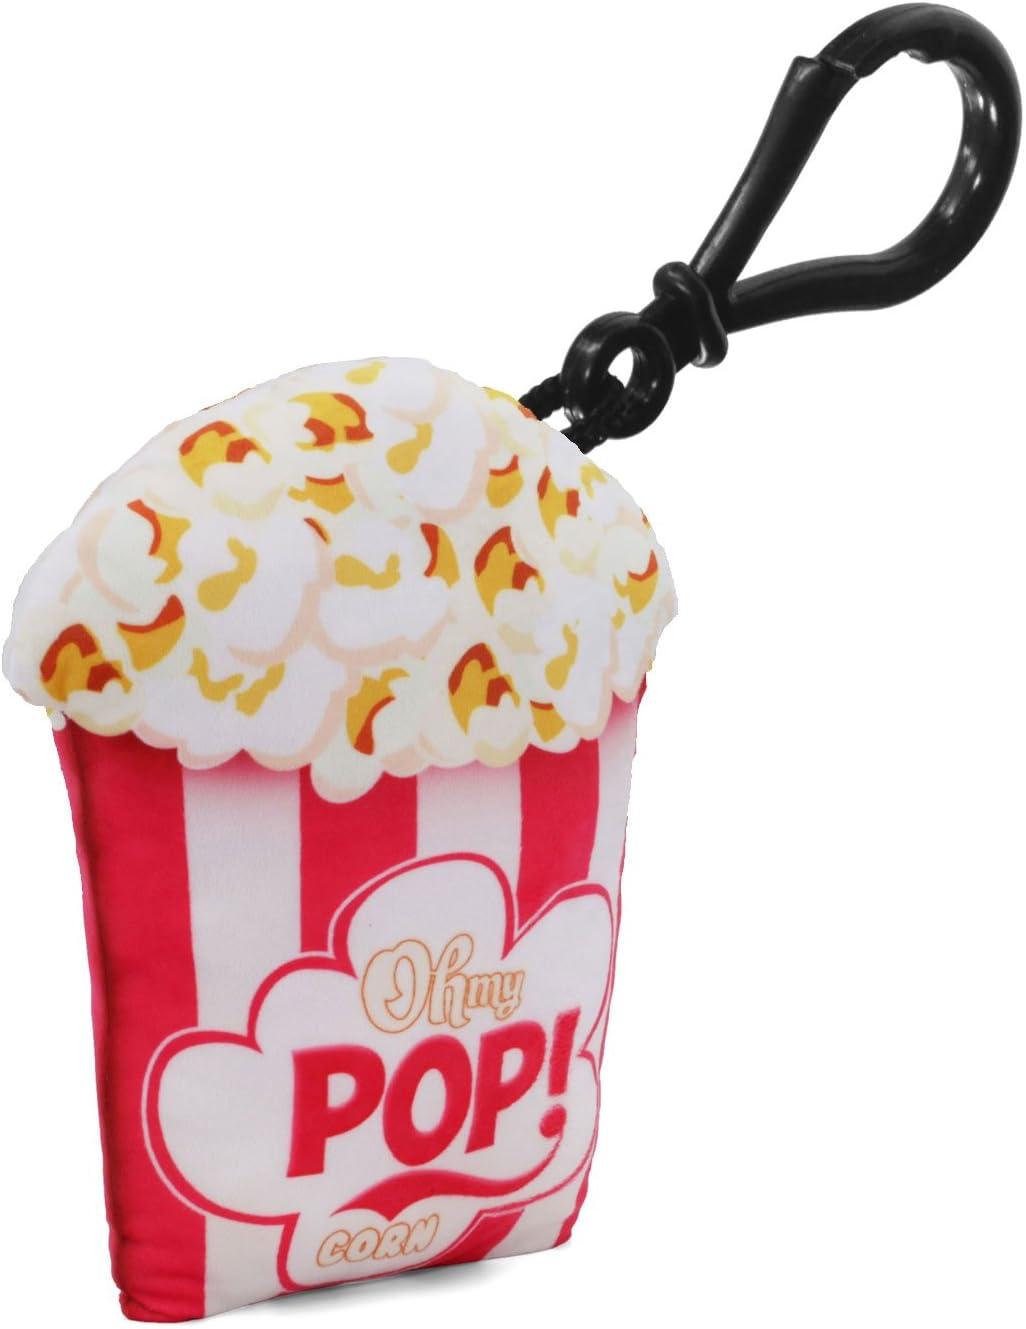 Bianco White 8 cm Oh My Pop Pop Crunchy-Pillow Keyring Portachiavi ad anello e catena